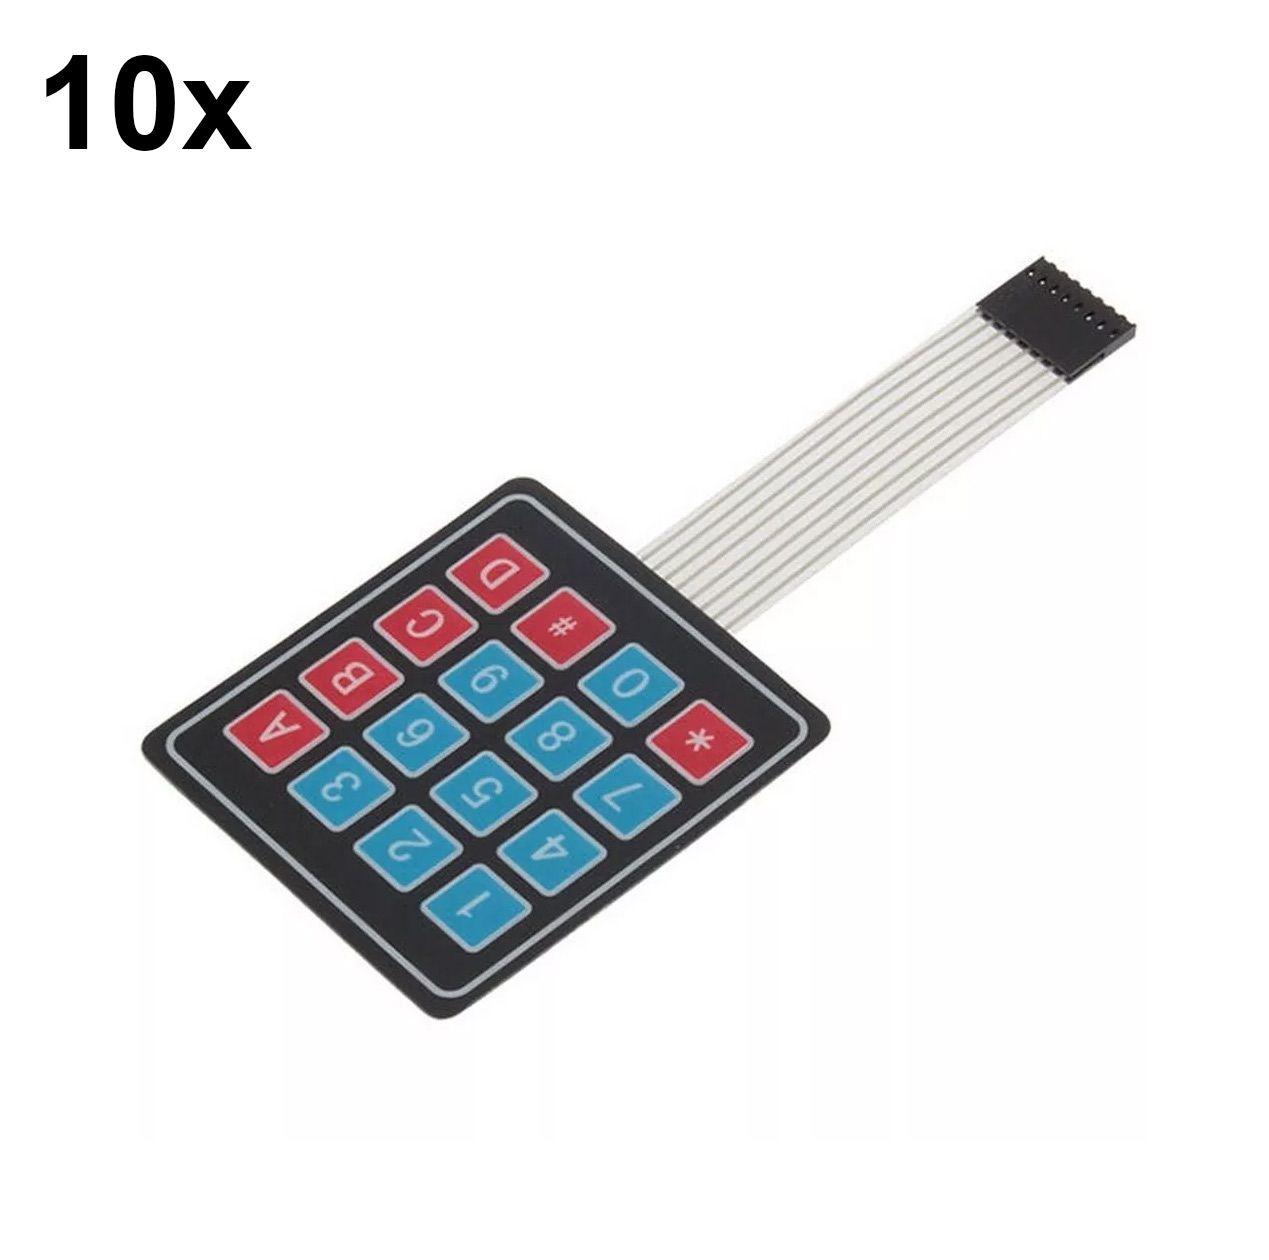 10x Teclado Membrana Matricial 4x4 16 Teclas Keypad Arduino